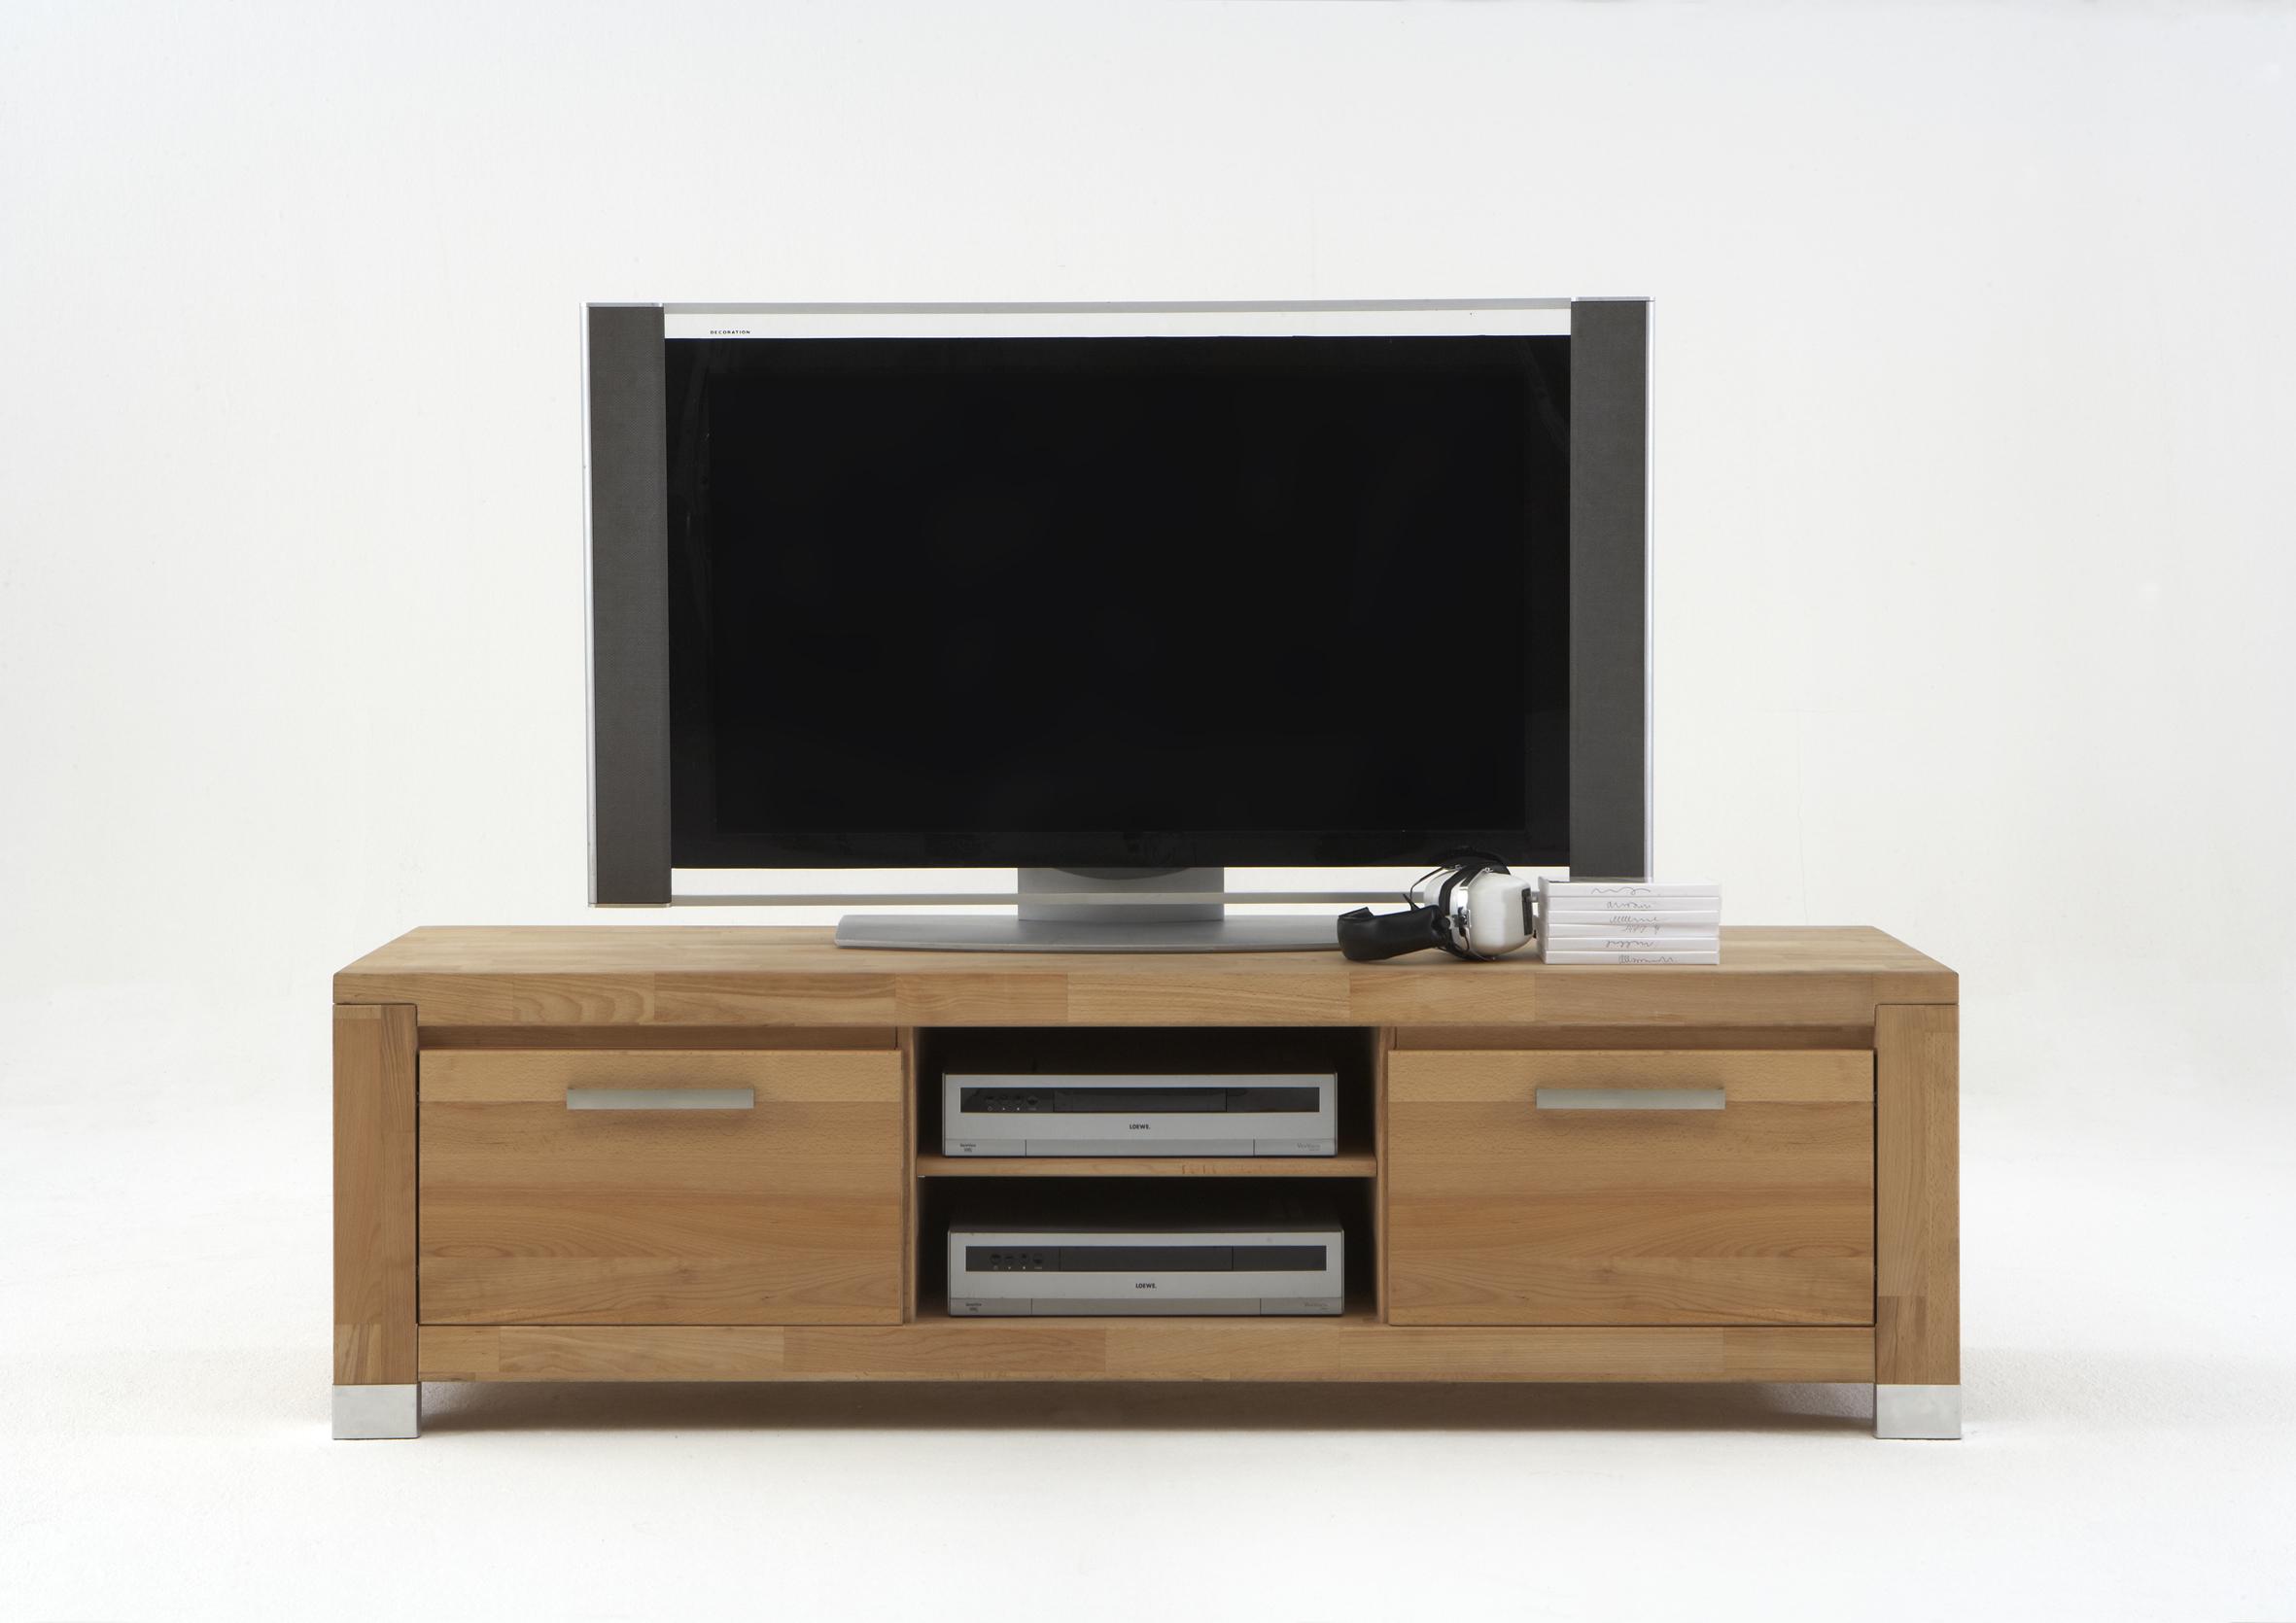 8601 6489 nike kernbuche massiv montiert aufgebaut tv lowboard. Black Bedroom Furniture Sets. Home Design Ideas